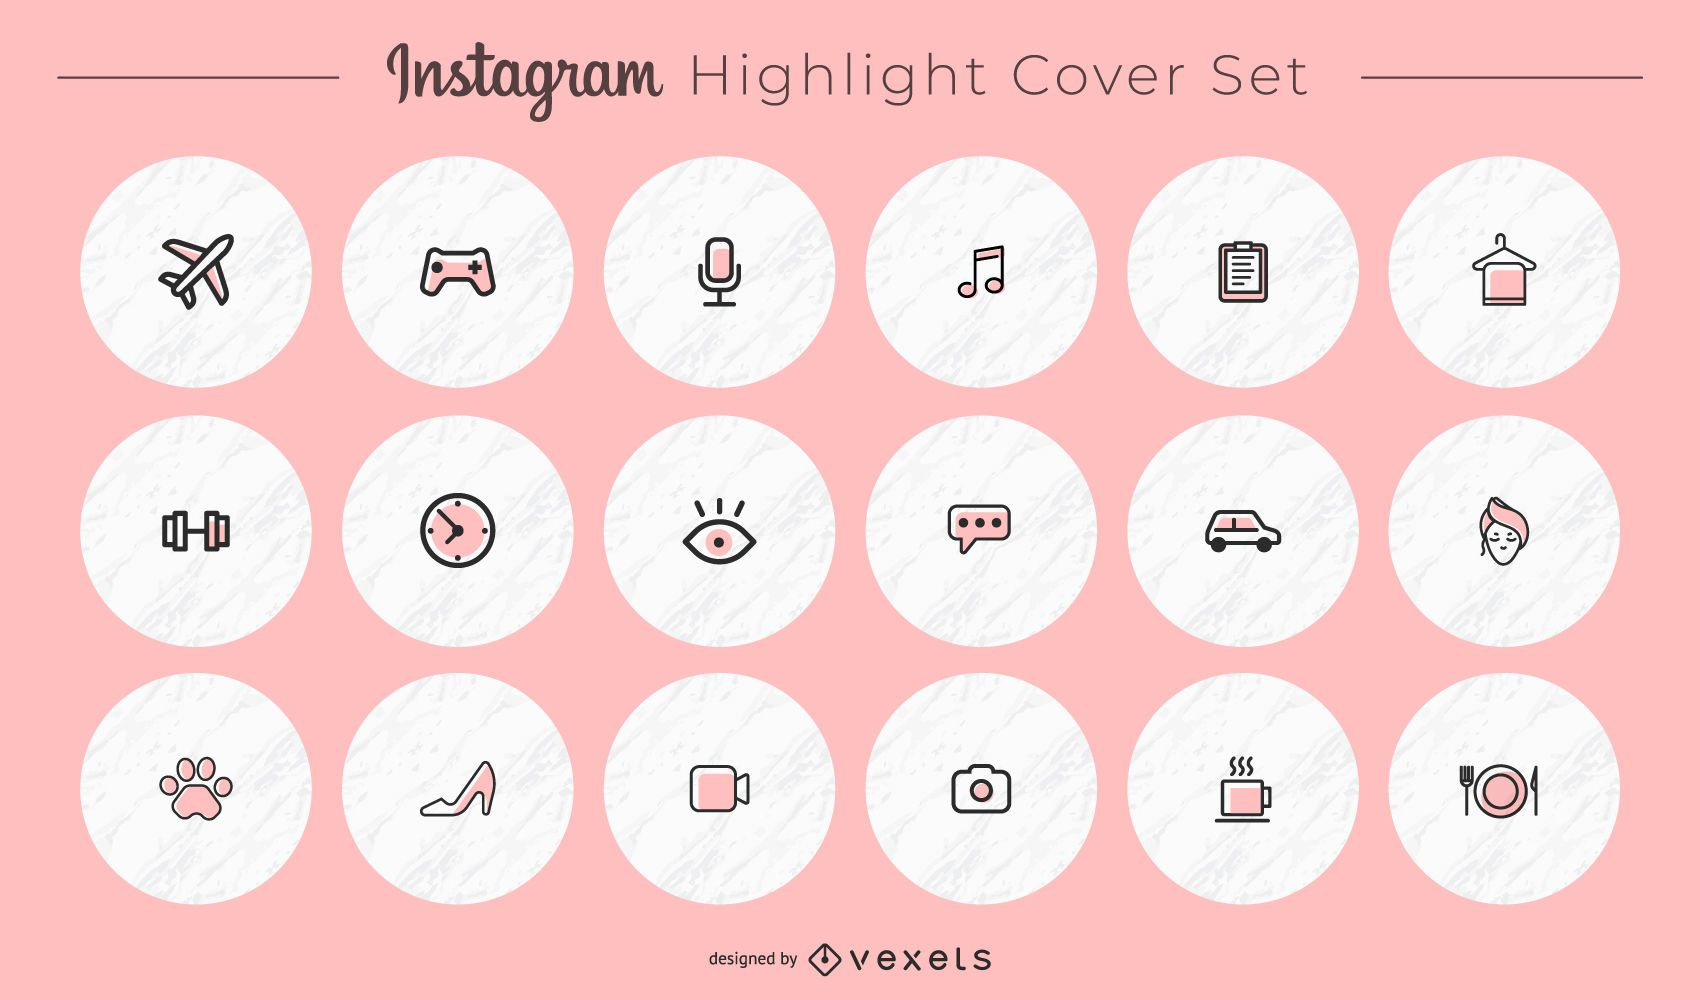 Paquete de portadas redondas de iconos varios de Instagram